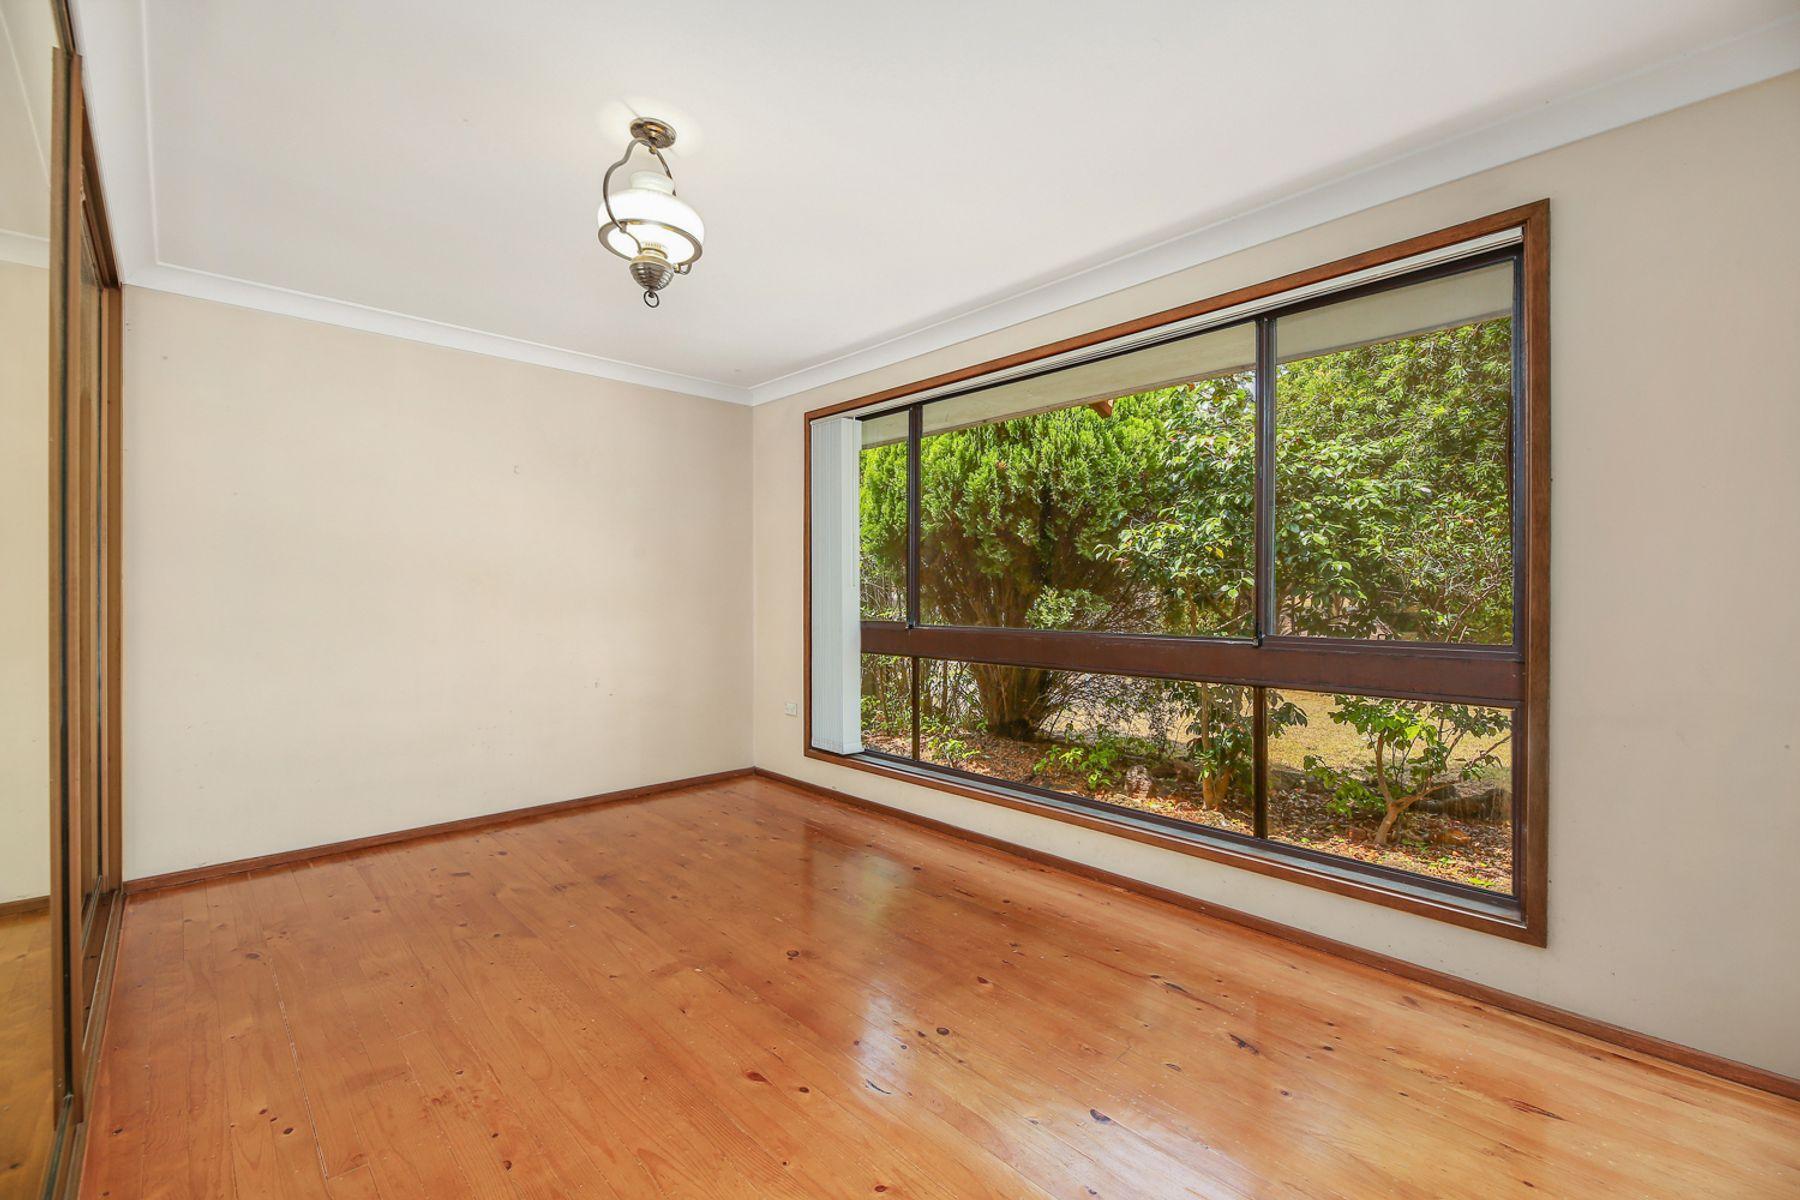 13 Dunstan Avenue, Milperra, NSW 2214